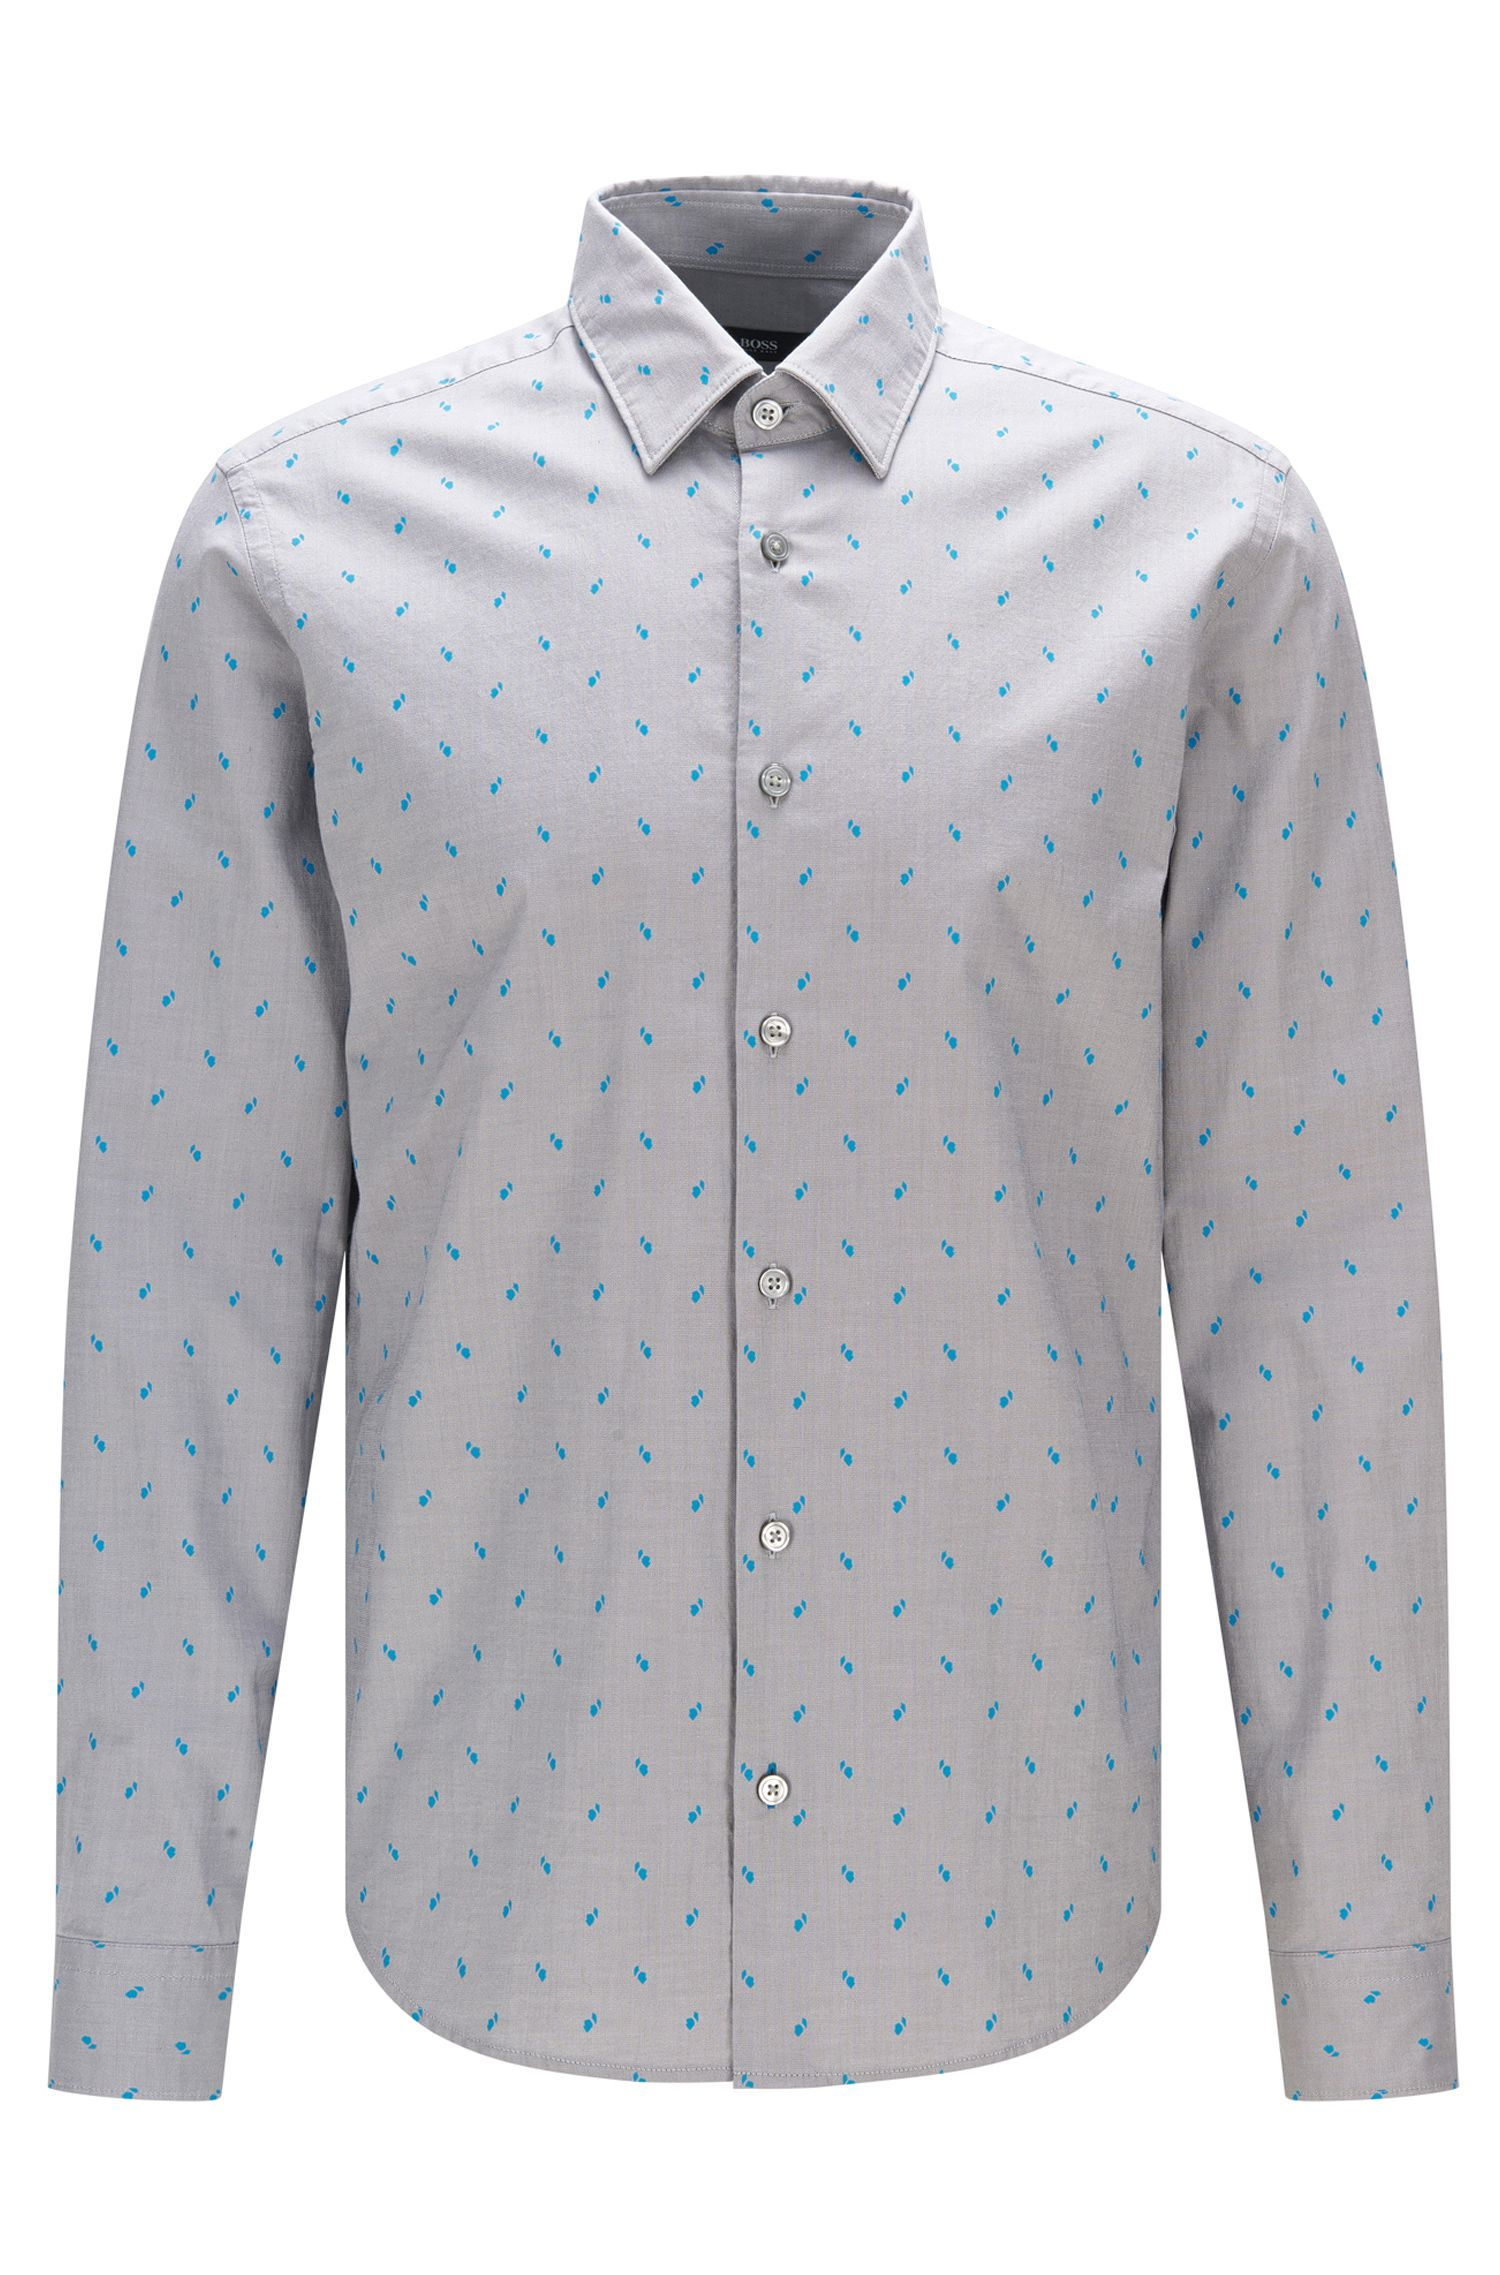 Dotted Stretch Cotton Button Down Shirt, Regular Fit | Lance